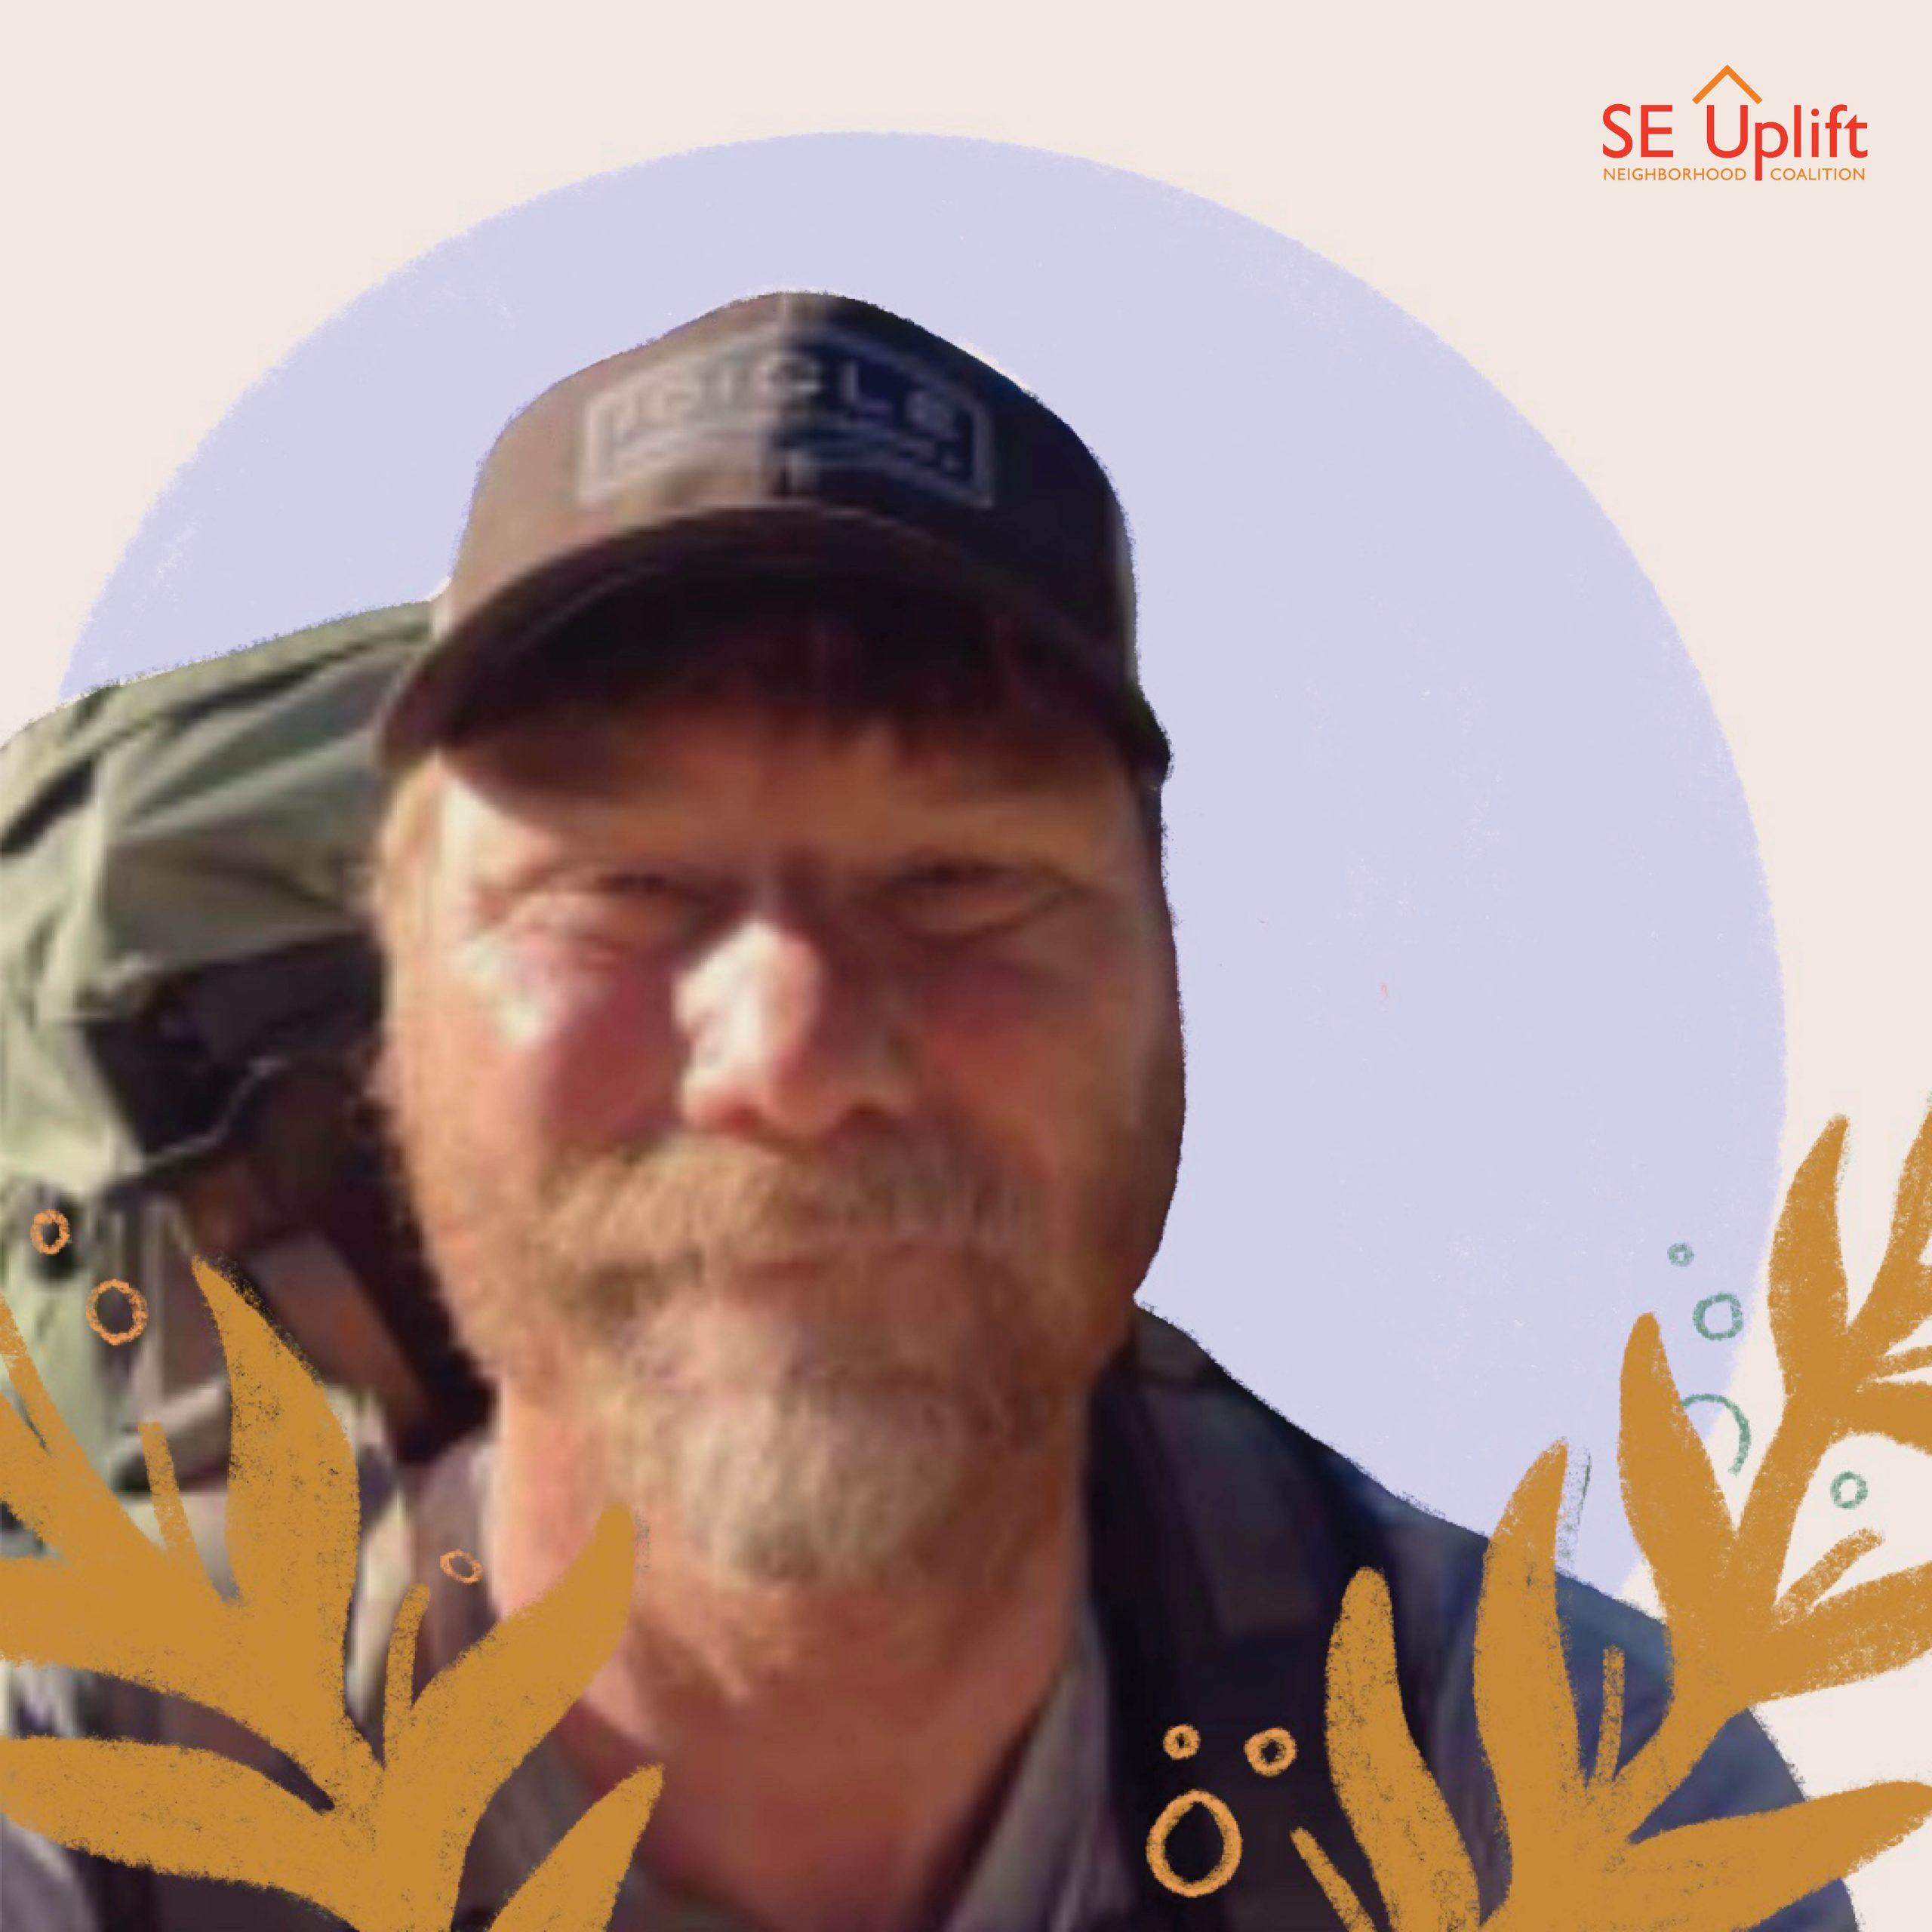 Leroy-website